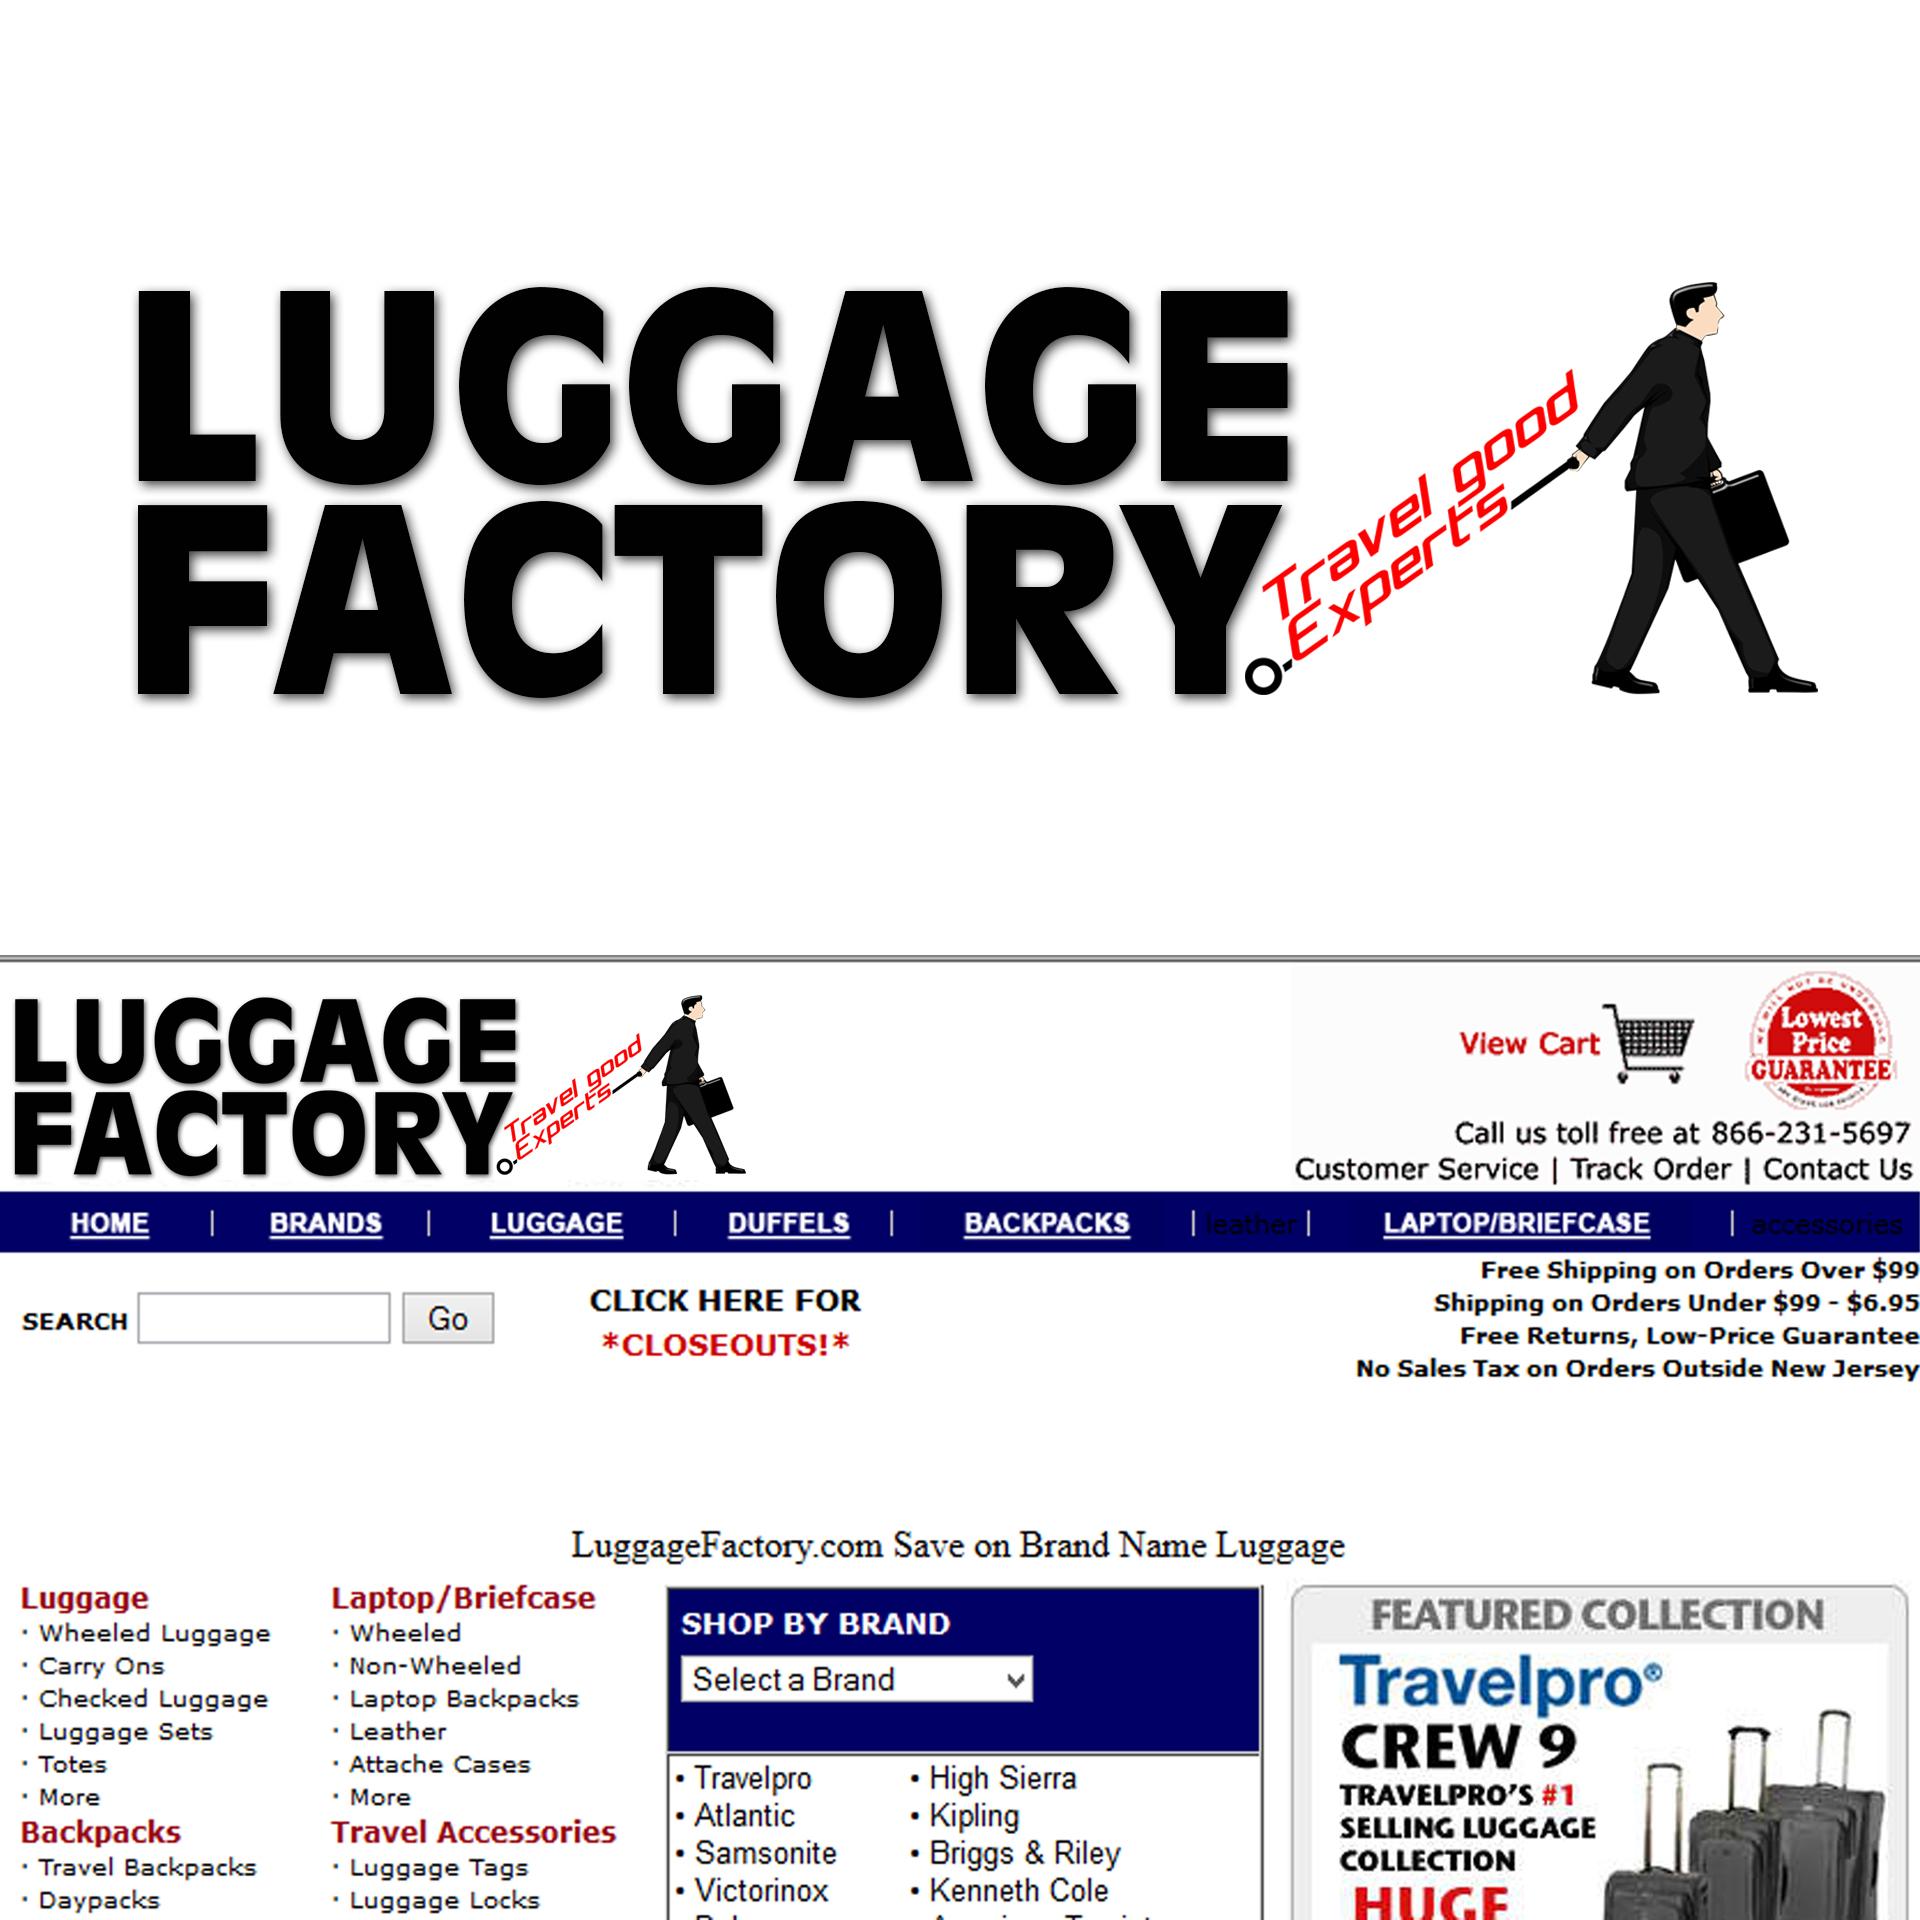 Logo Design by chAnDOS - Entry No. 105 in the Logo Design Contest Creative Logo Design for Luggage Factory.